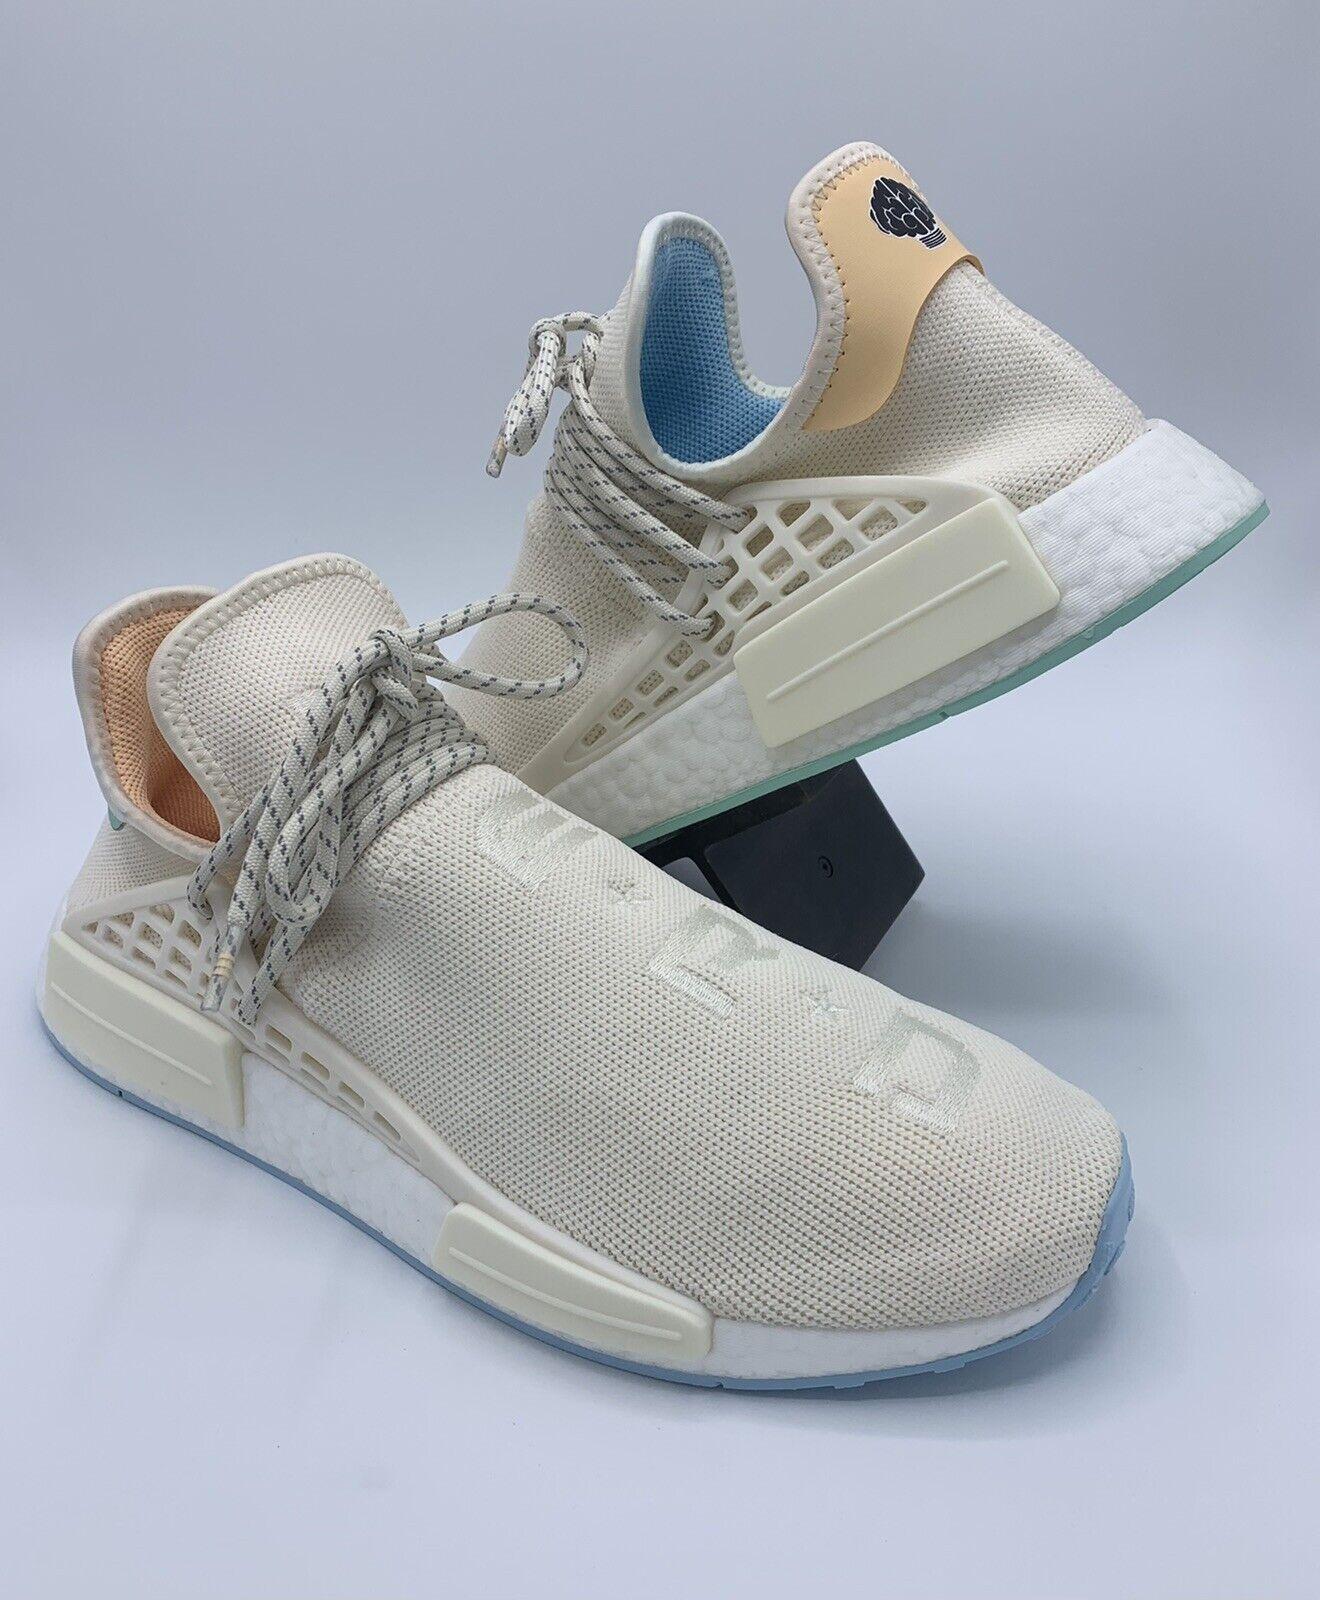 Adidas x Pharrell Williams HU NMD N.E.R.D Men's Size 12 Chalk White GW0246